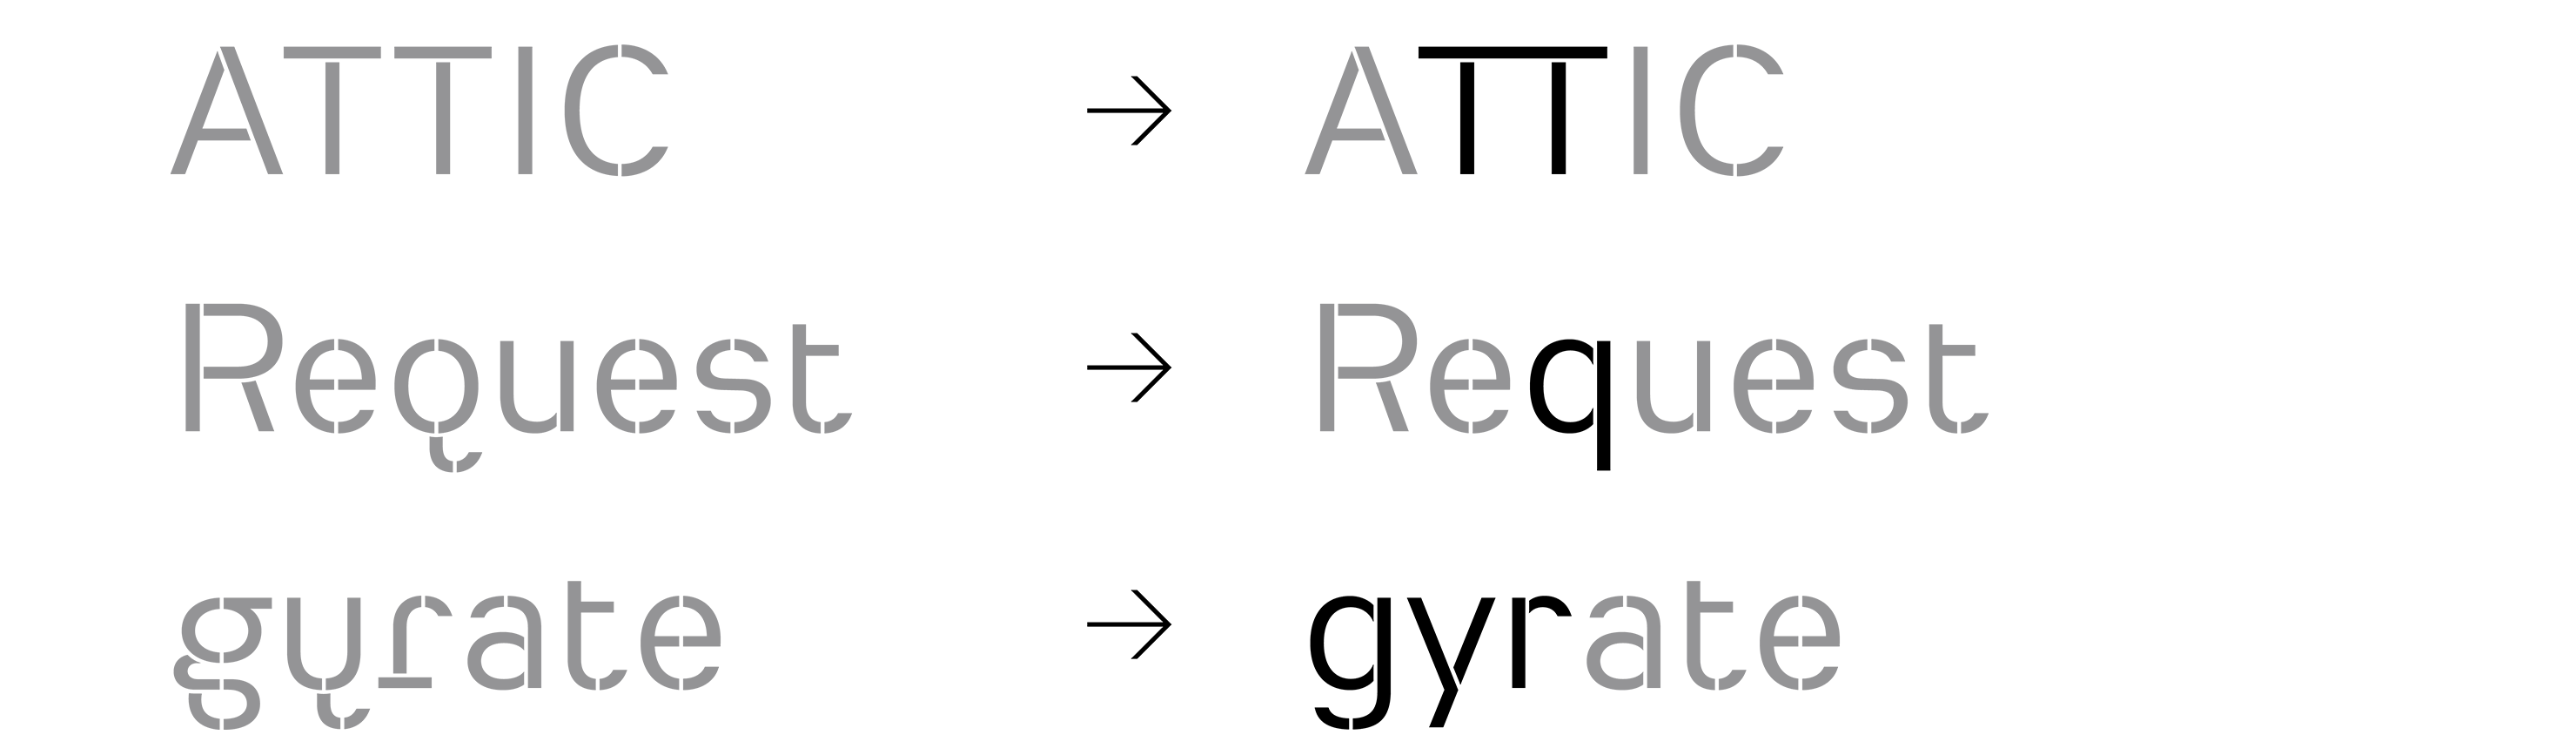 Typeface-Heimat-Stencil-F05-Atlas-Font-Foundry